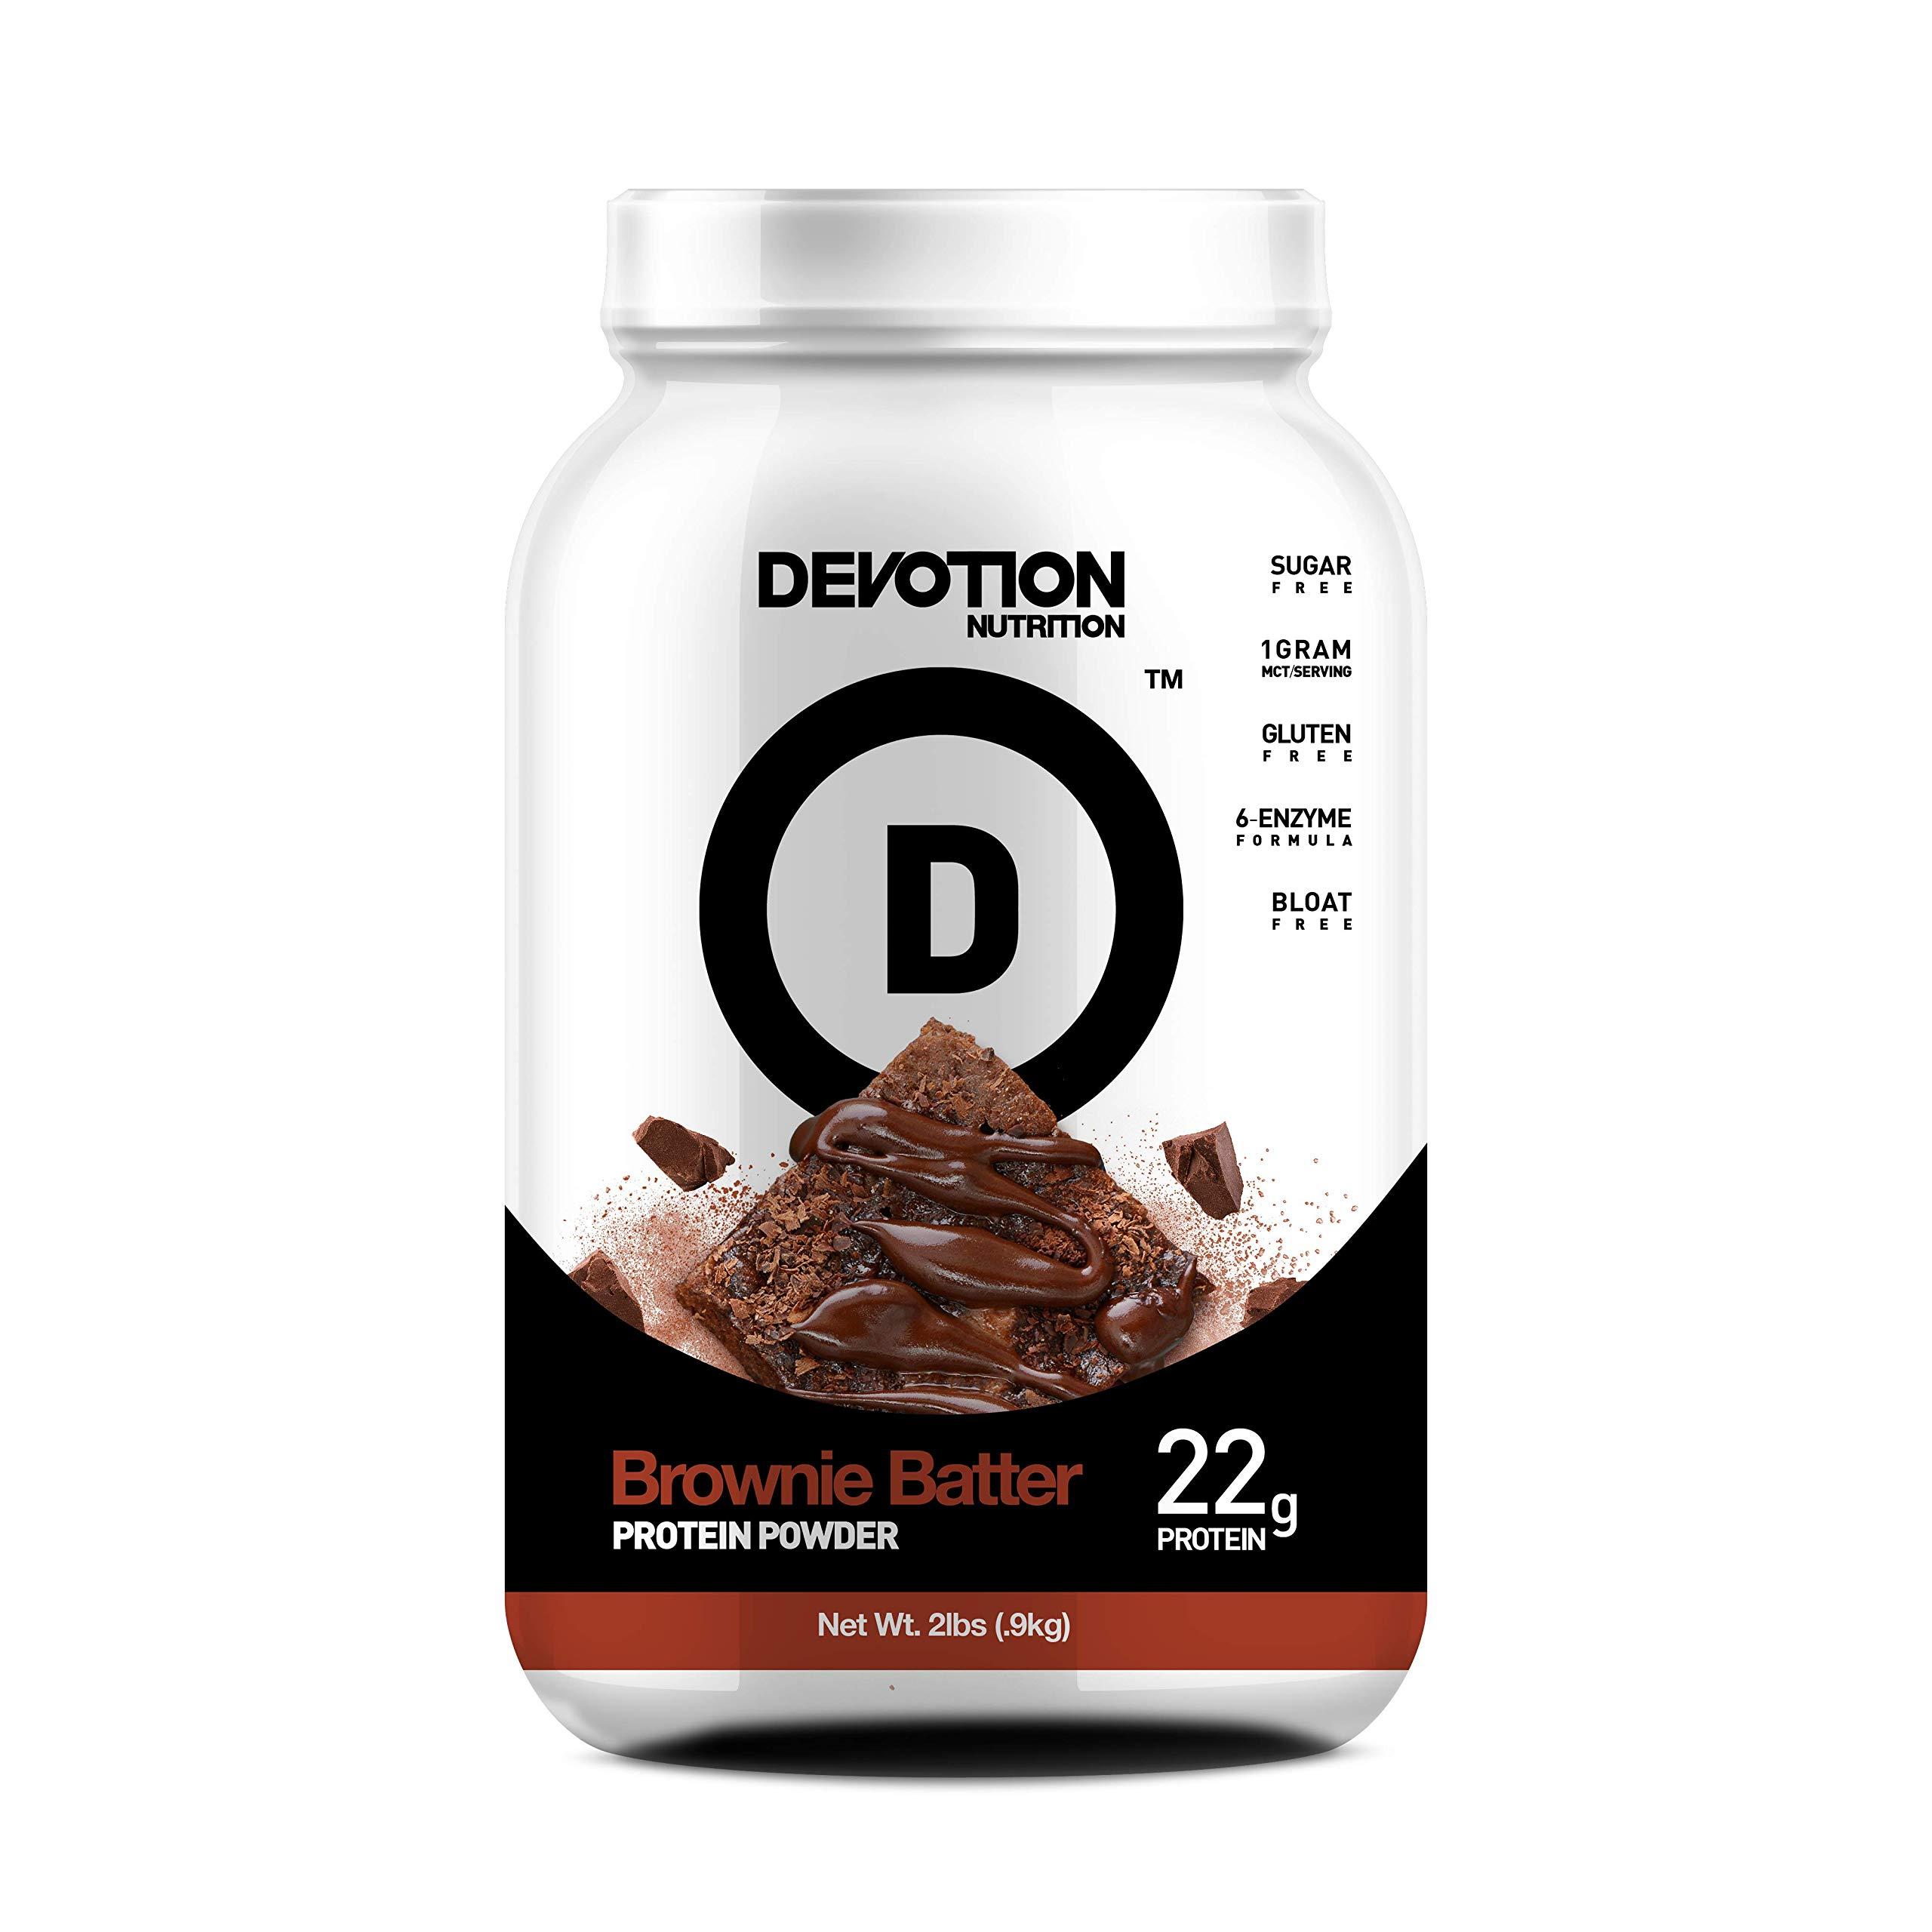 Devotion Nutrition Protein Powder, Brownie Batter, 20 Grams Protein, 1 Gram Mct, Protein Baking Powder, Whey Protein Powder, Low Carb Protein, 2 Pound Tub, 1 Count by Devotion Nutrition